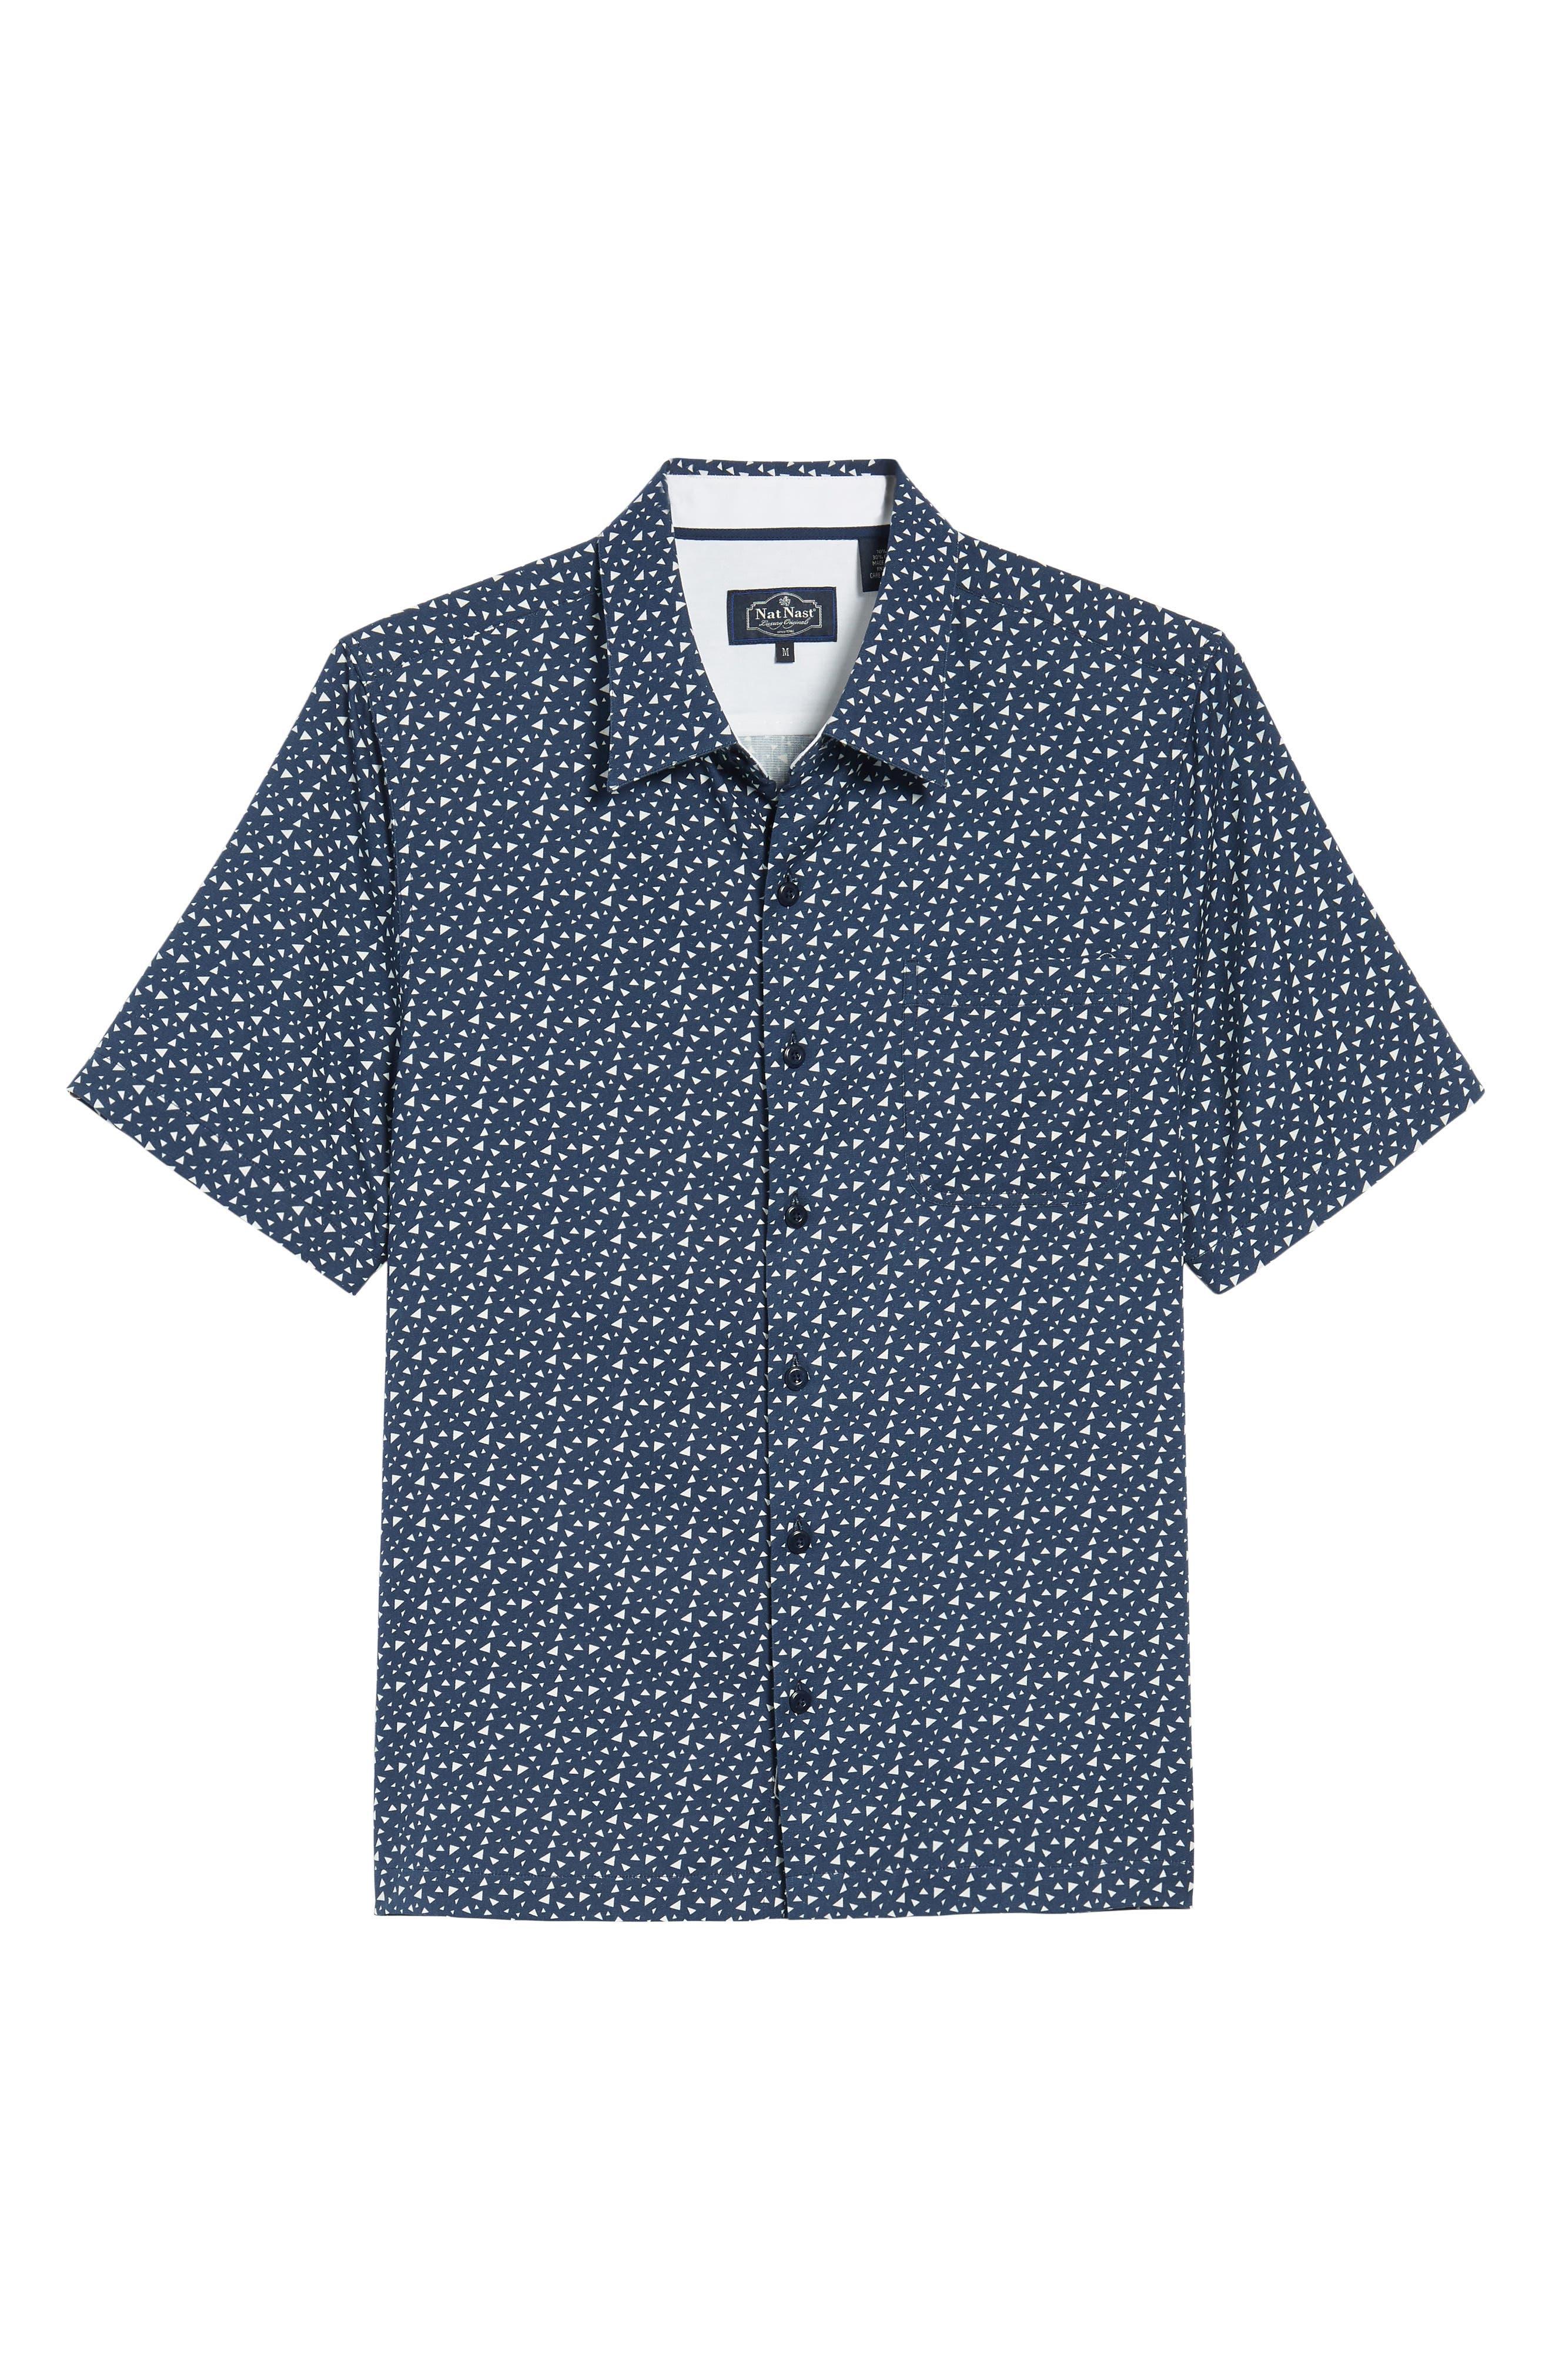 Bermuda Triangle Camp Shirt,                             Alternate thumbnail 6, color,                             Nat Blue